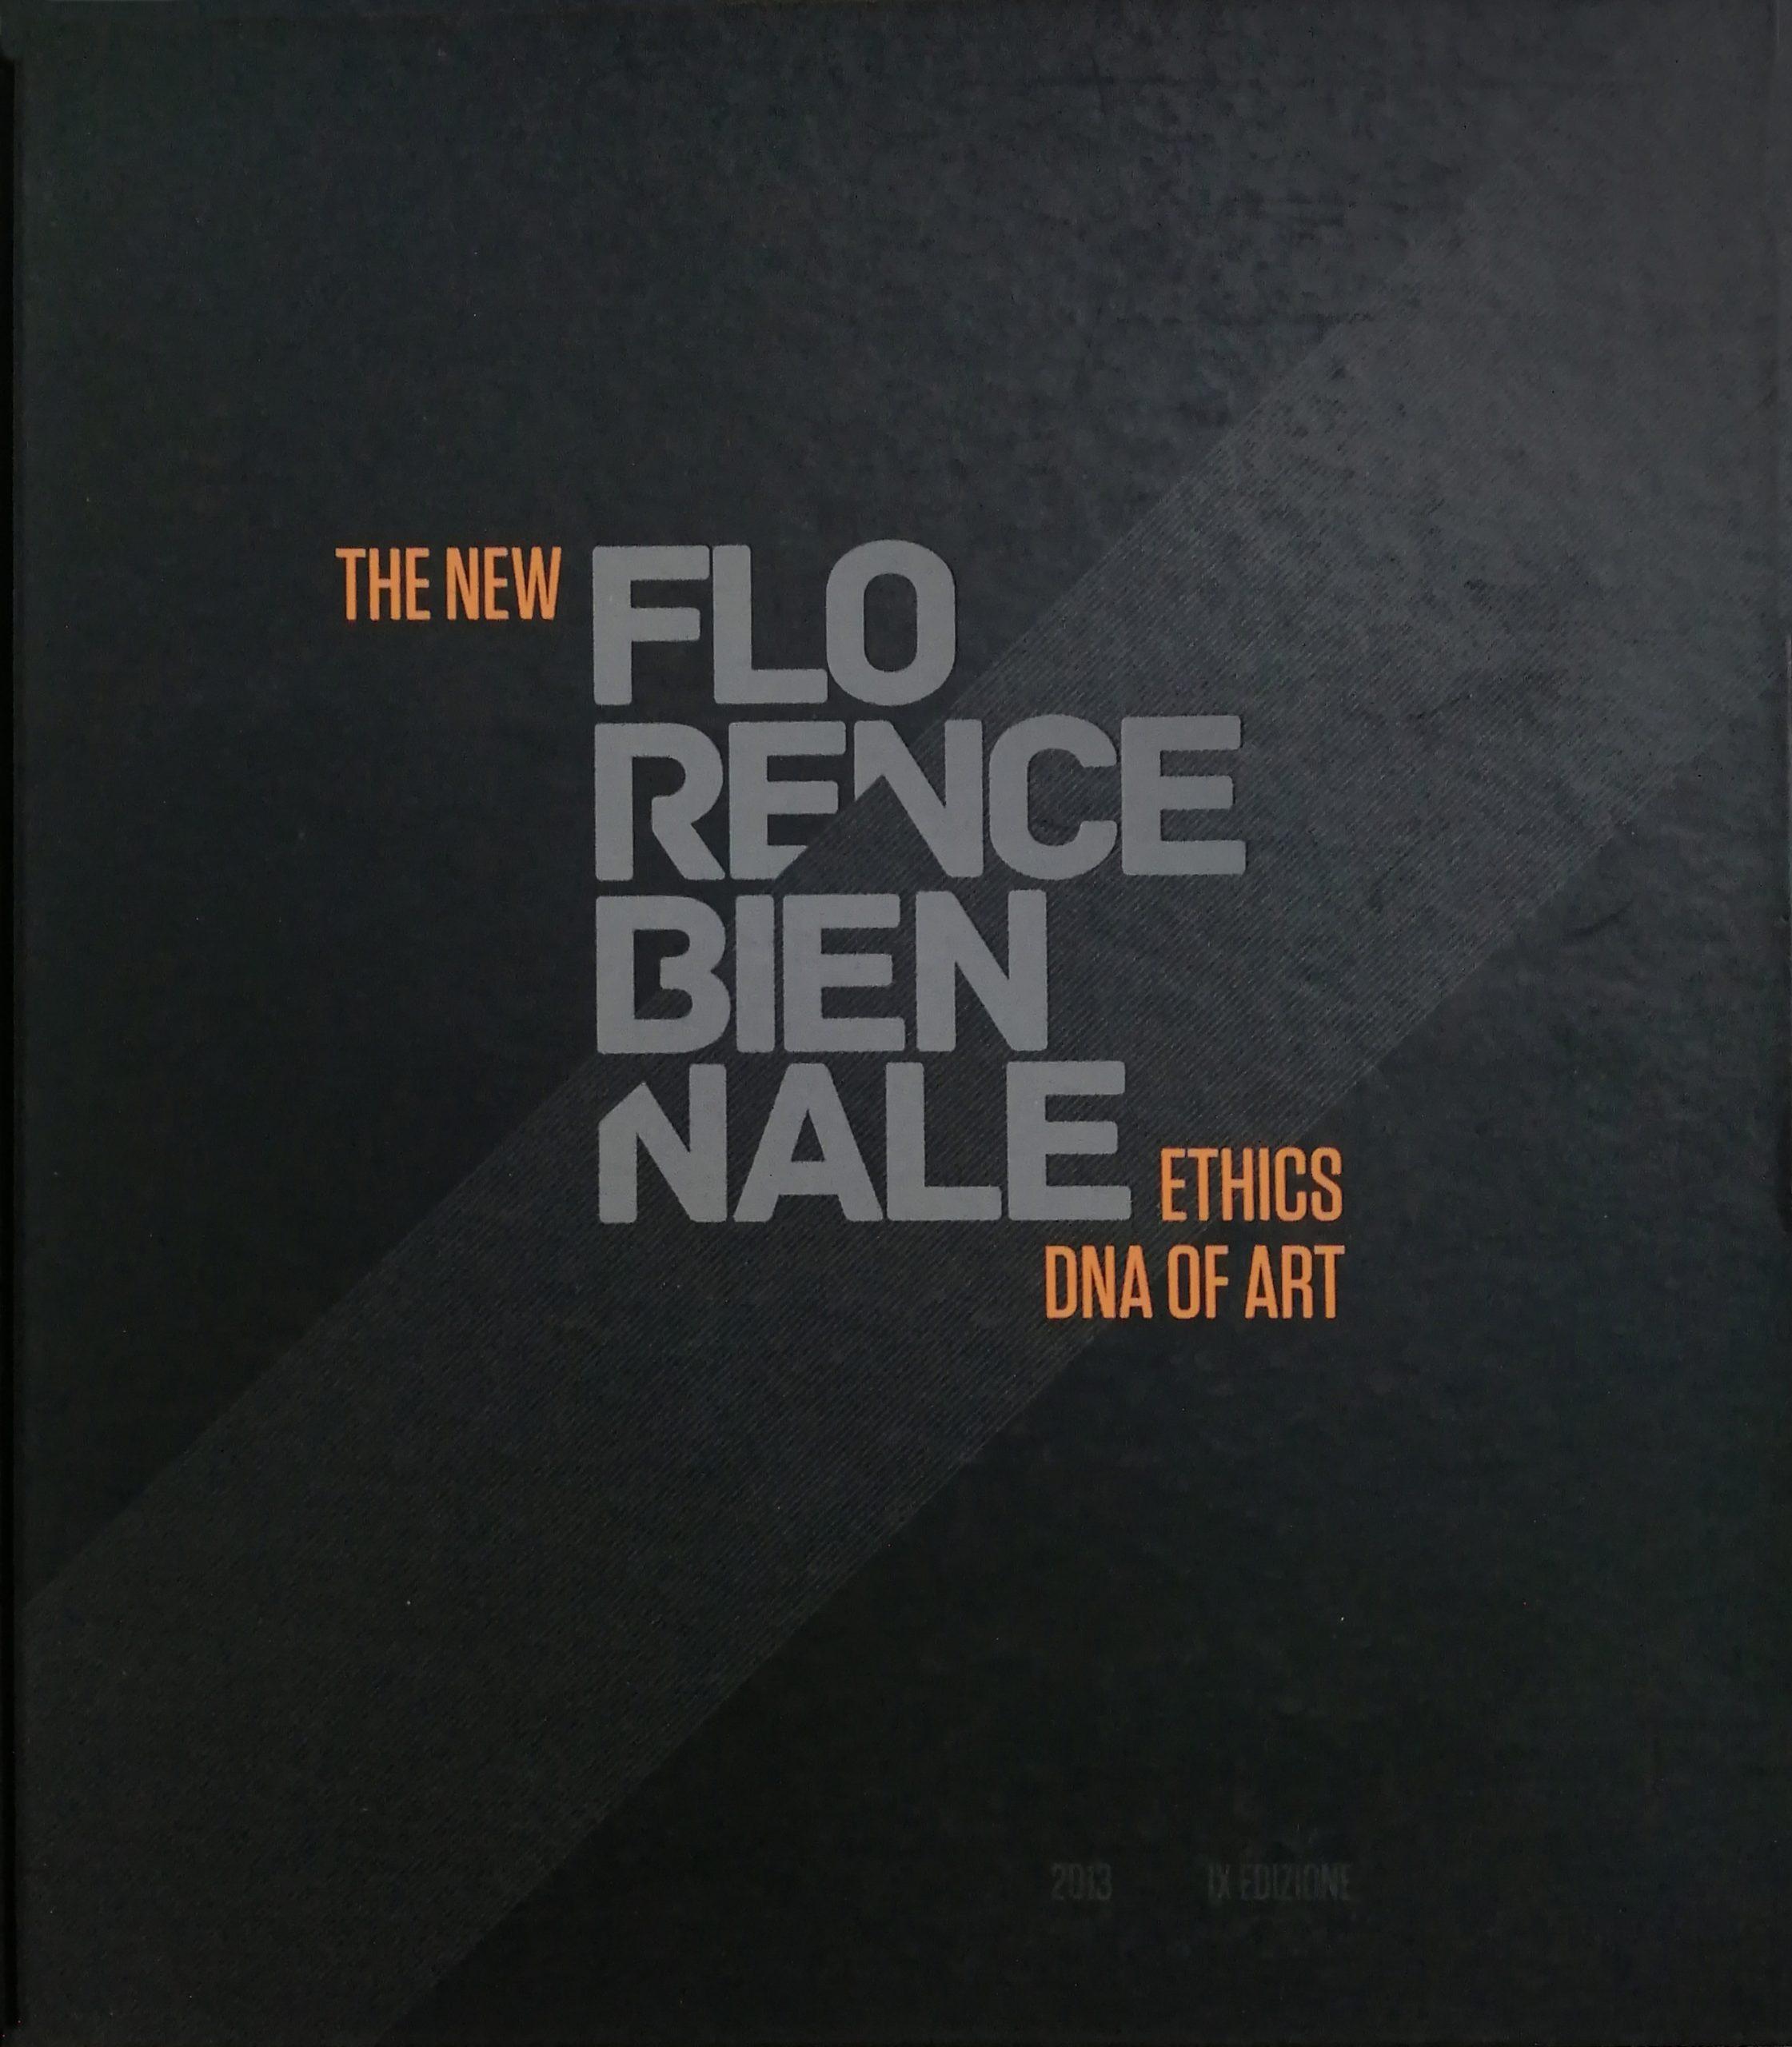 2013 Florence Art Biennale Casino dellarte Firenze scaled - Bibliography/ Catalogues